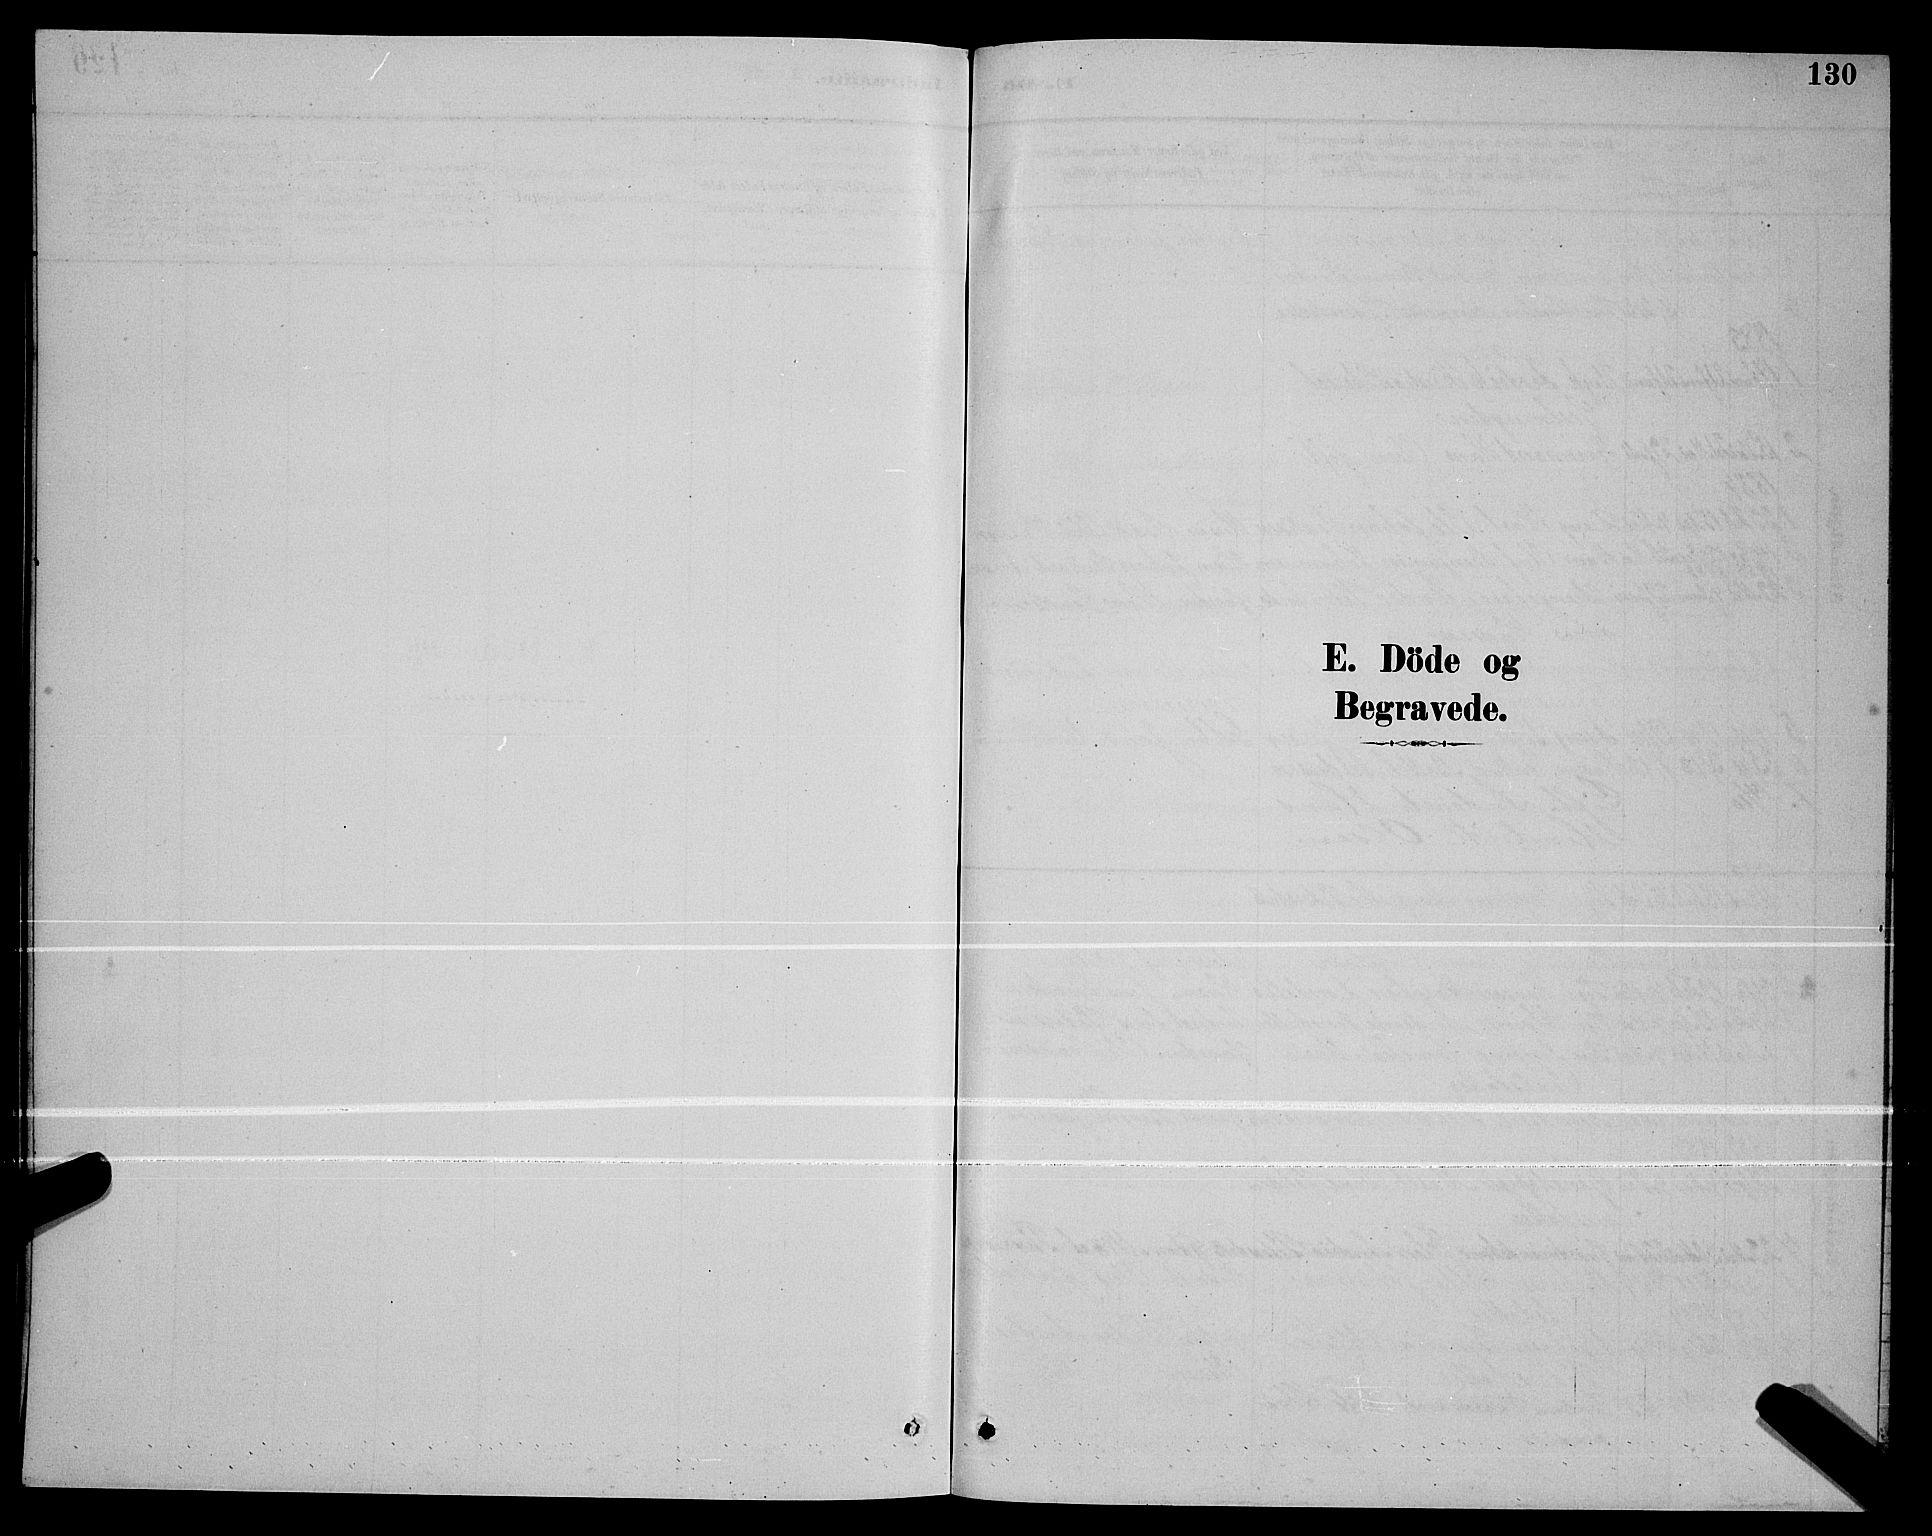 SAT, Ministerialprotokoller, klokkerbøker og fødselsregistre - Nordland, 803/L0076: Klokkerbok nr. 803C03, 1882-1897, s. 130